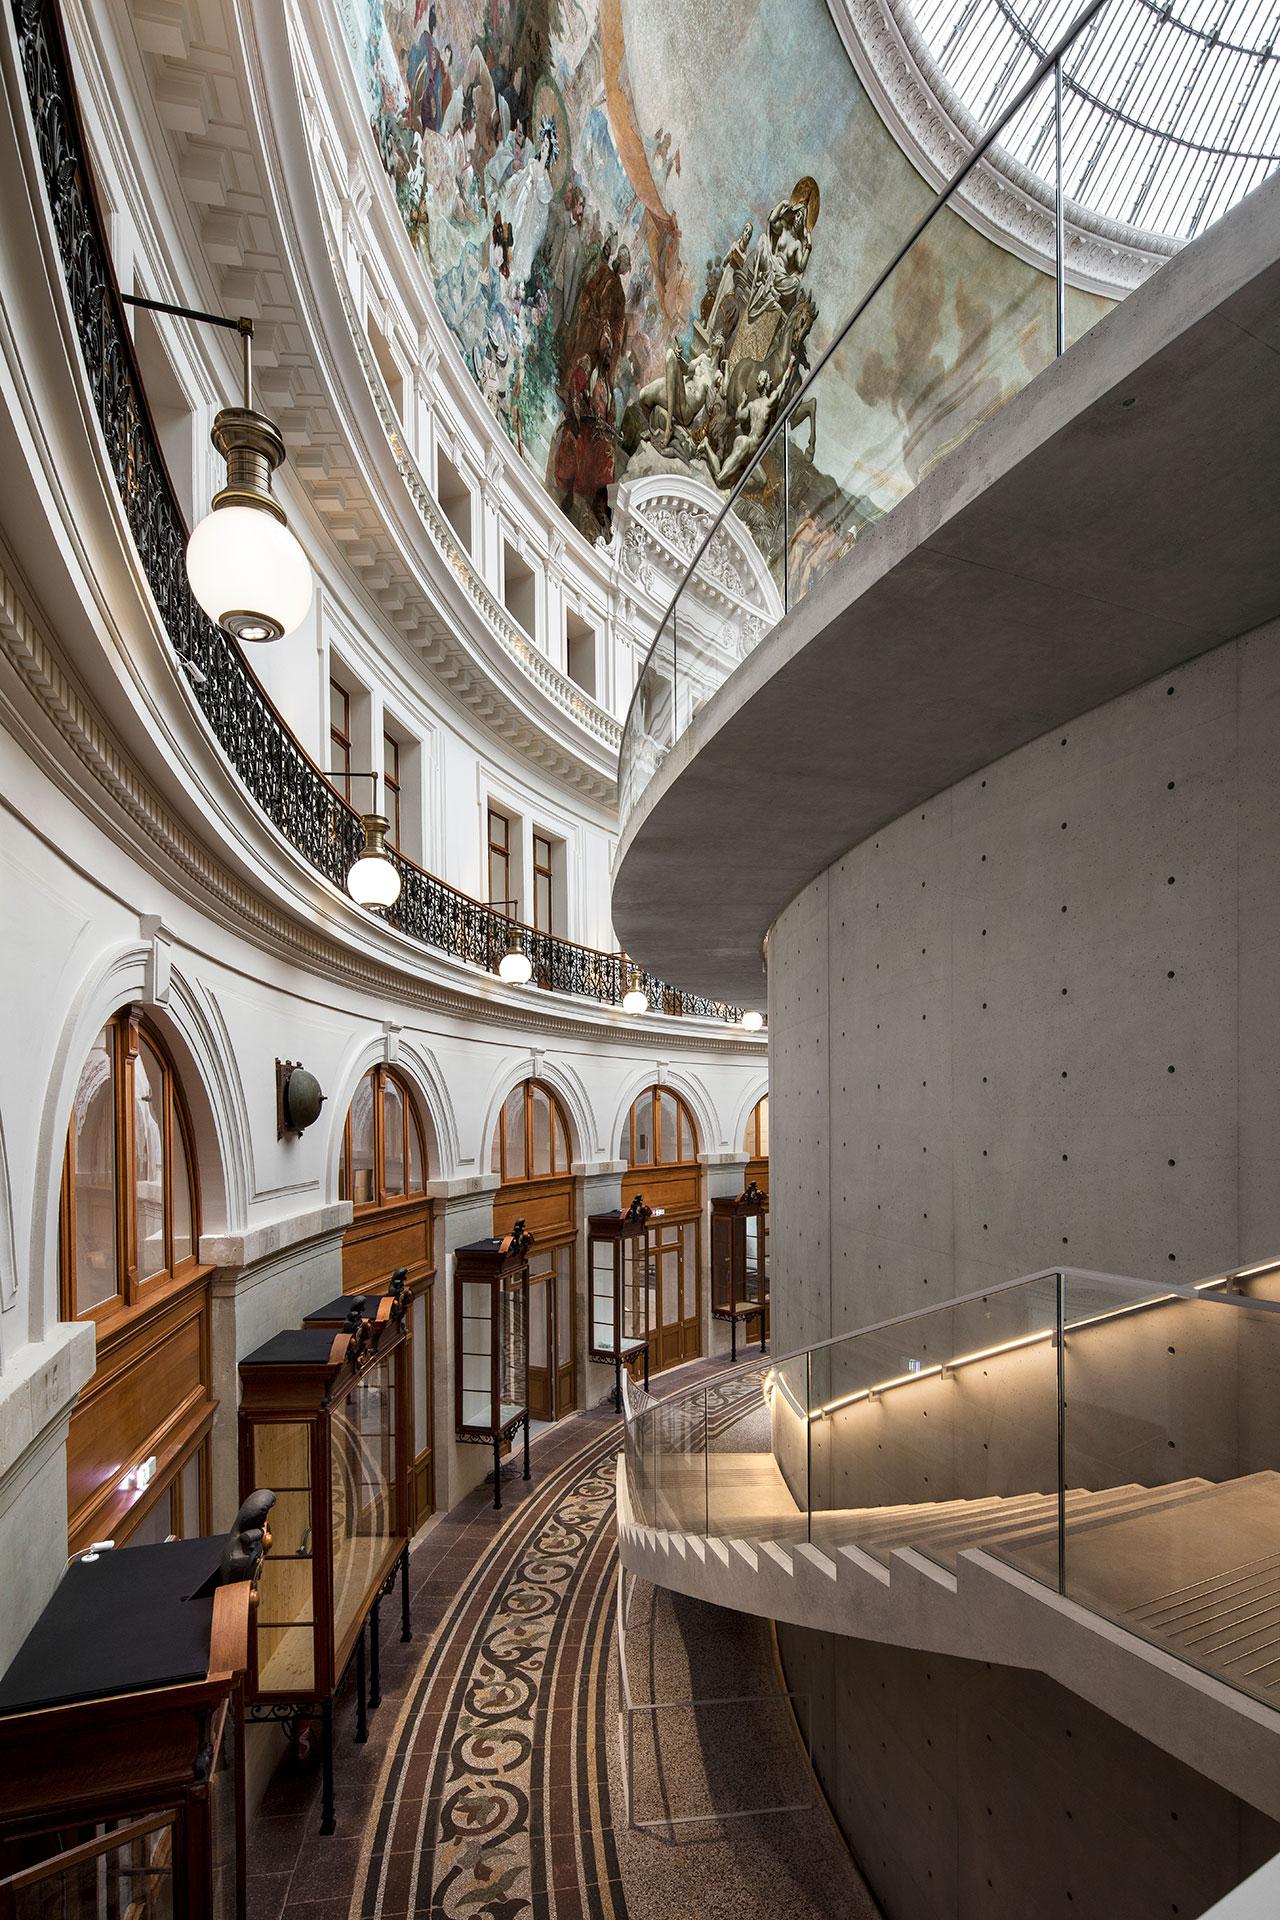 Bourse de Commerce — Pinault Collection © Tadao Ando Architect & Associates, Niney et Marca Architectes, Agence Pierre-Antoine Gatier. Photography byPatrick Tourneboeuf.